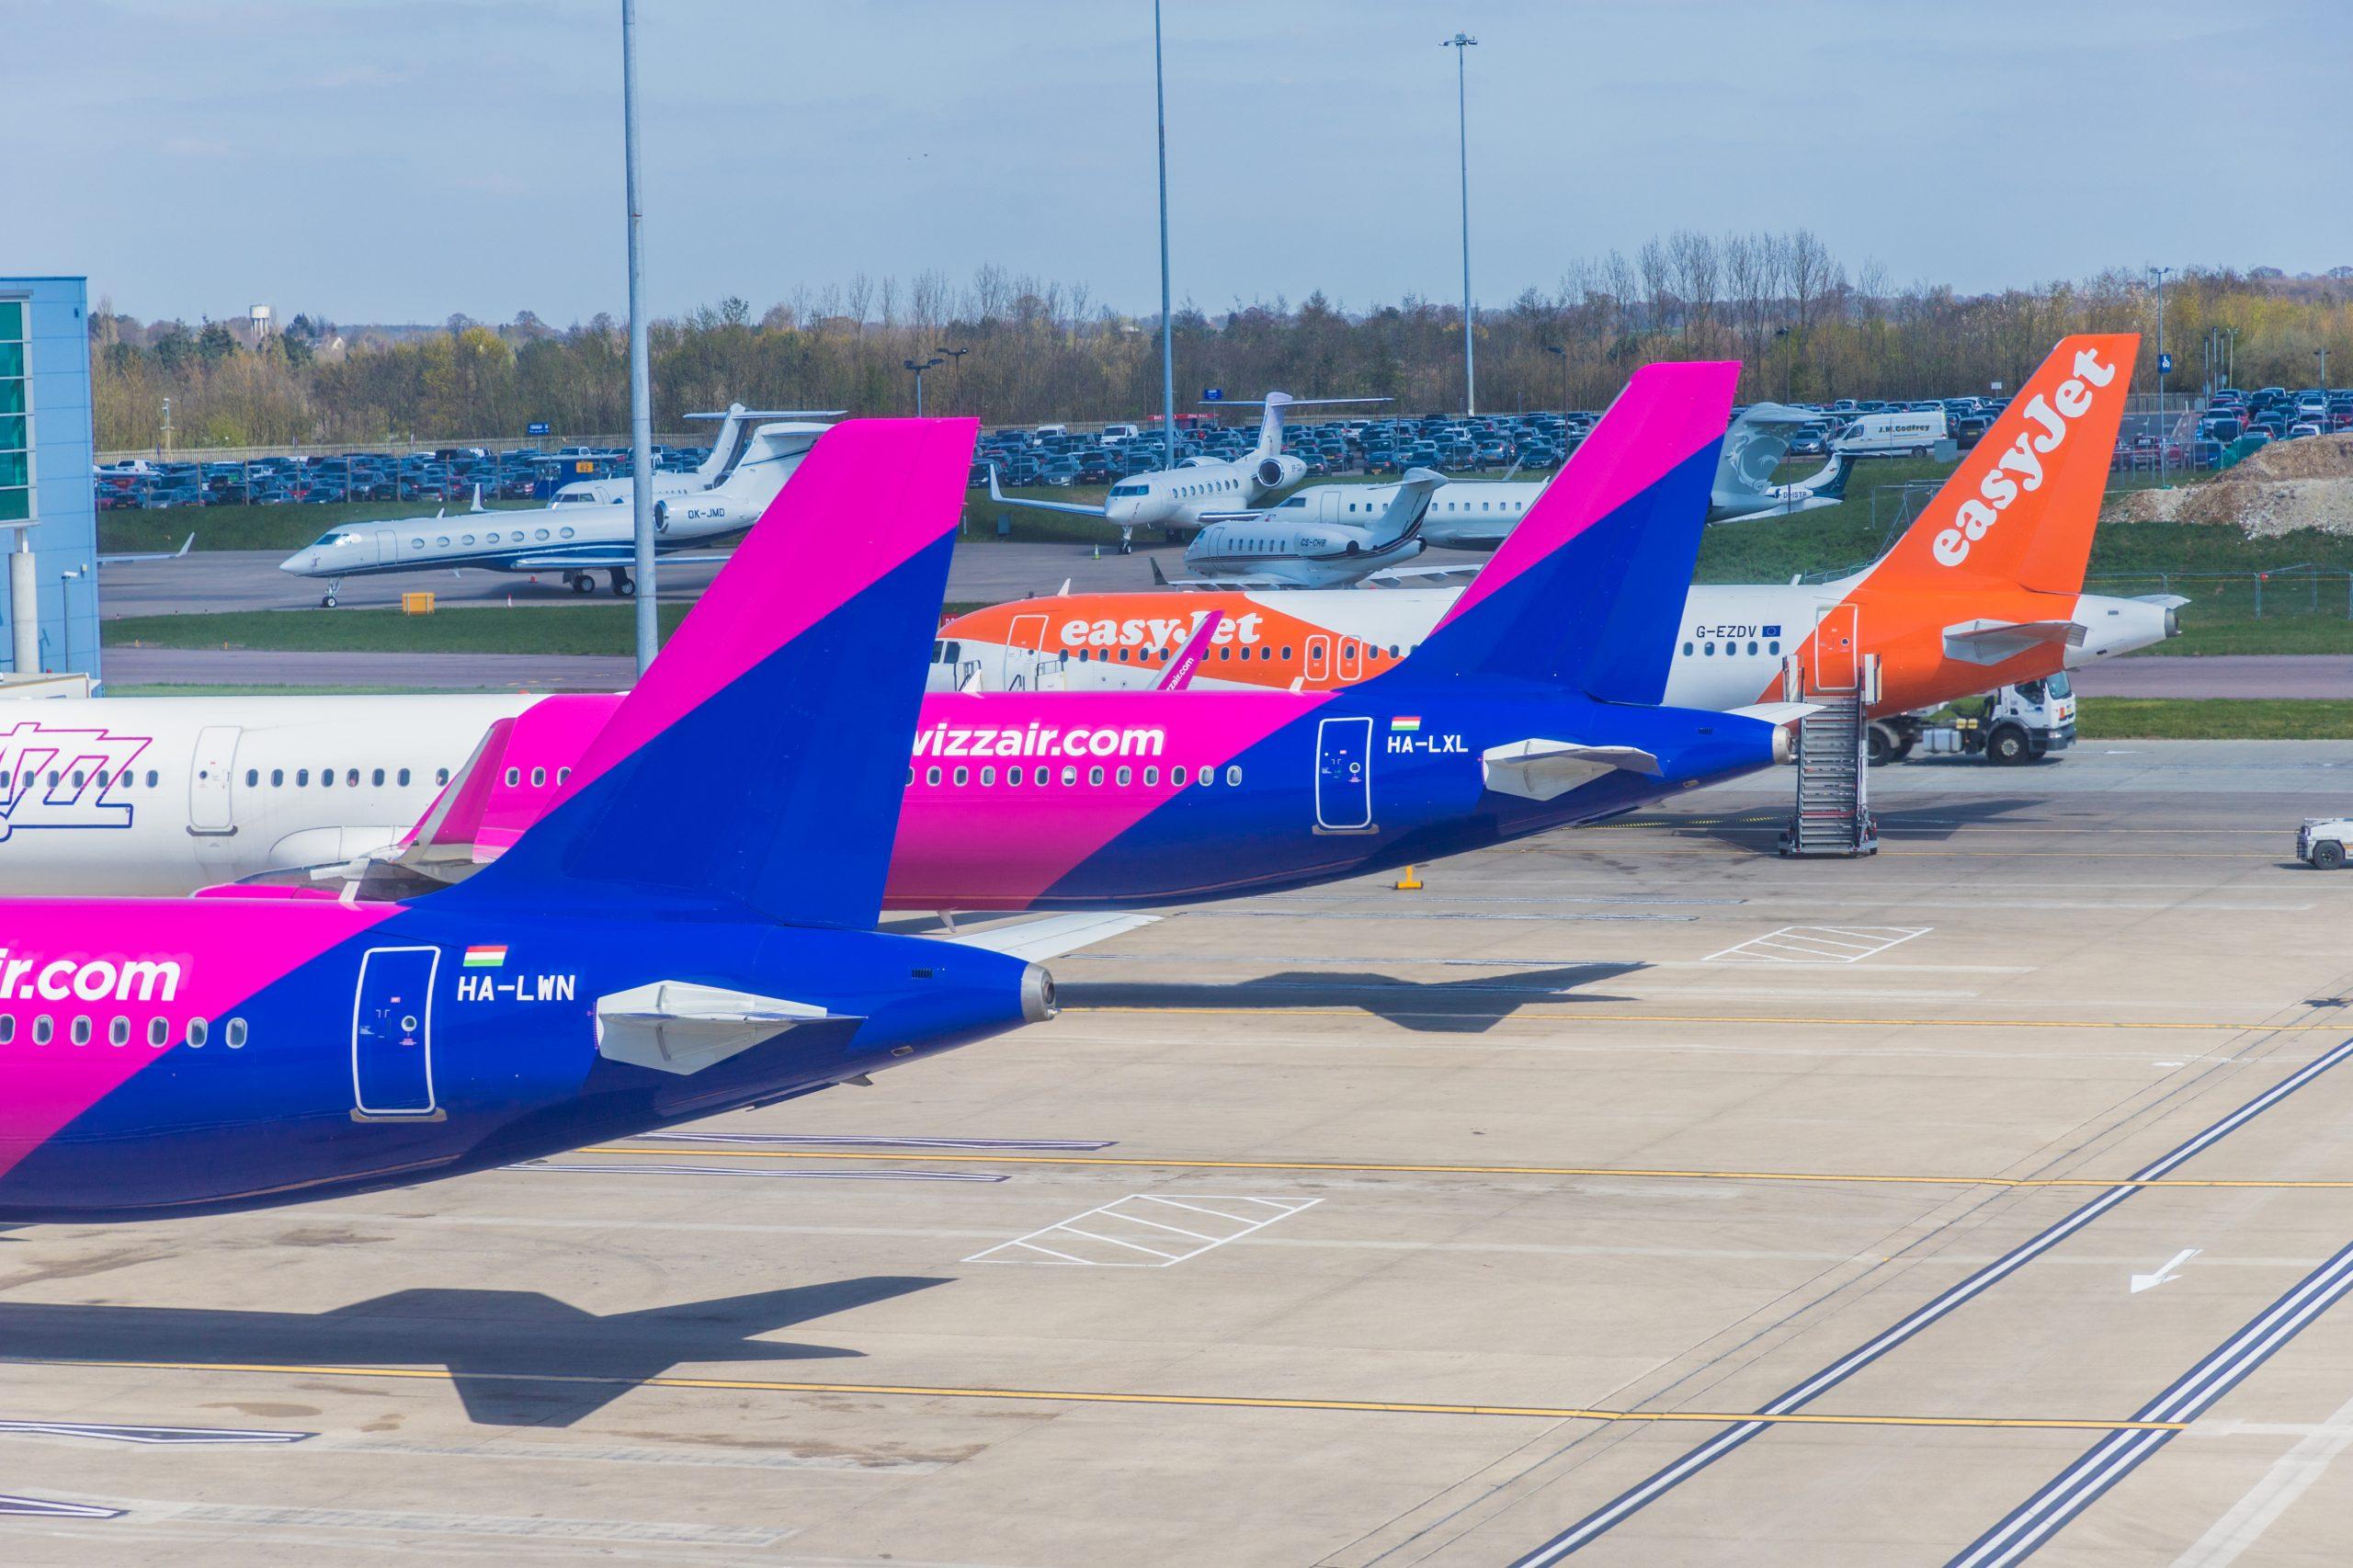 Fly fra Wizz Air og easyJet i London Luton Airport. (Foto: Chrispictures   shutterstock)